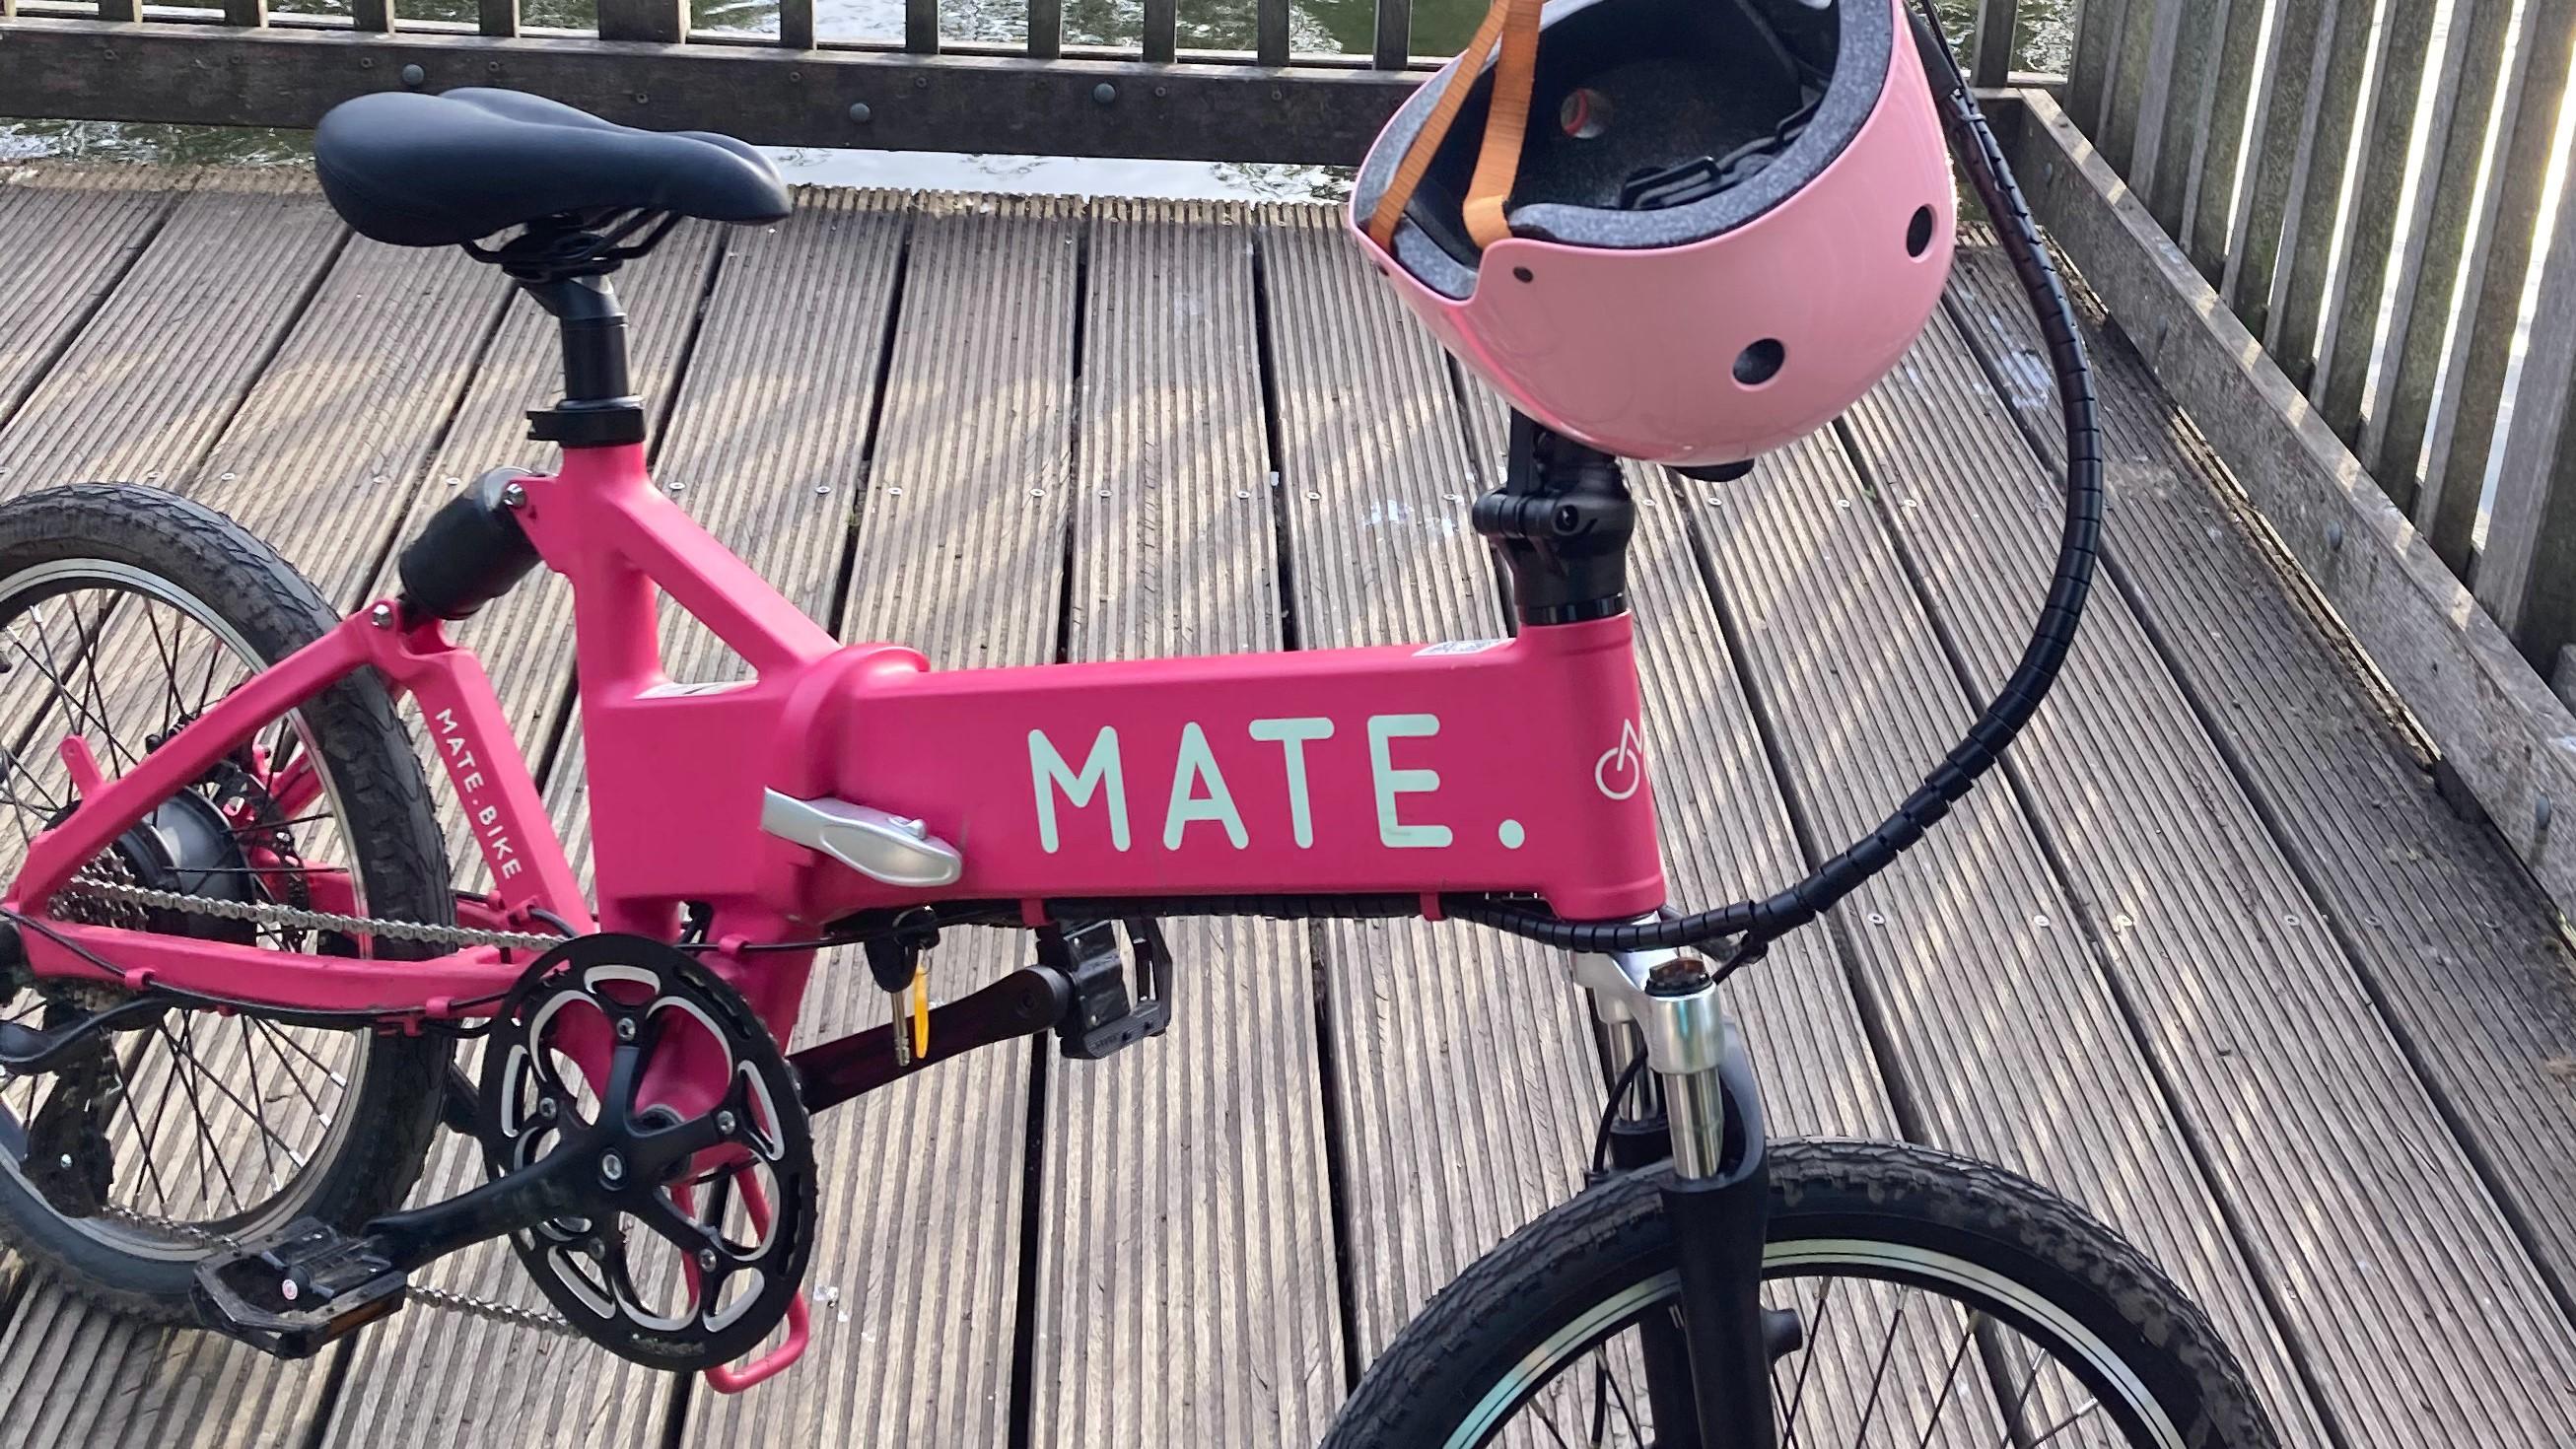 Mate City